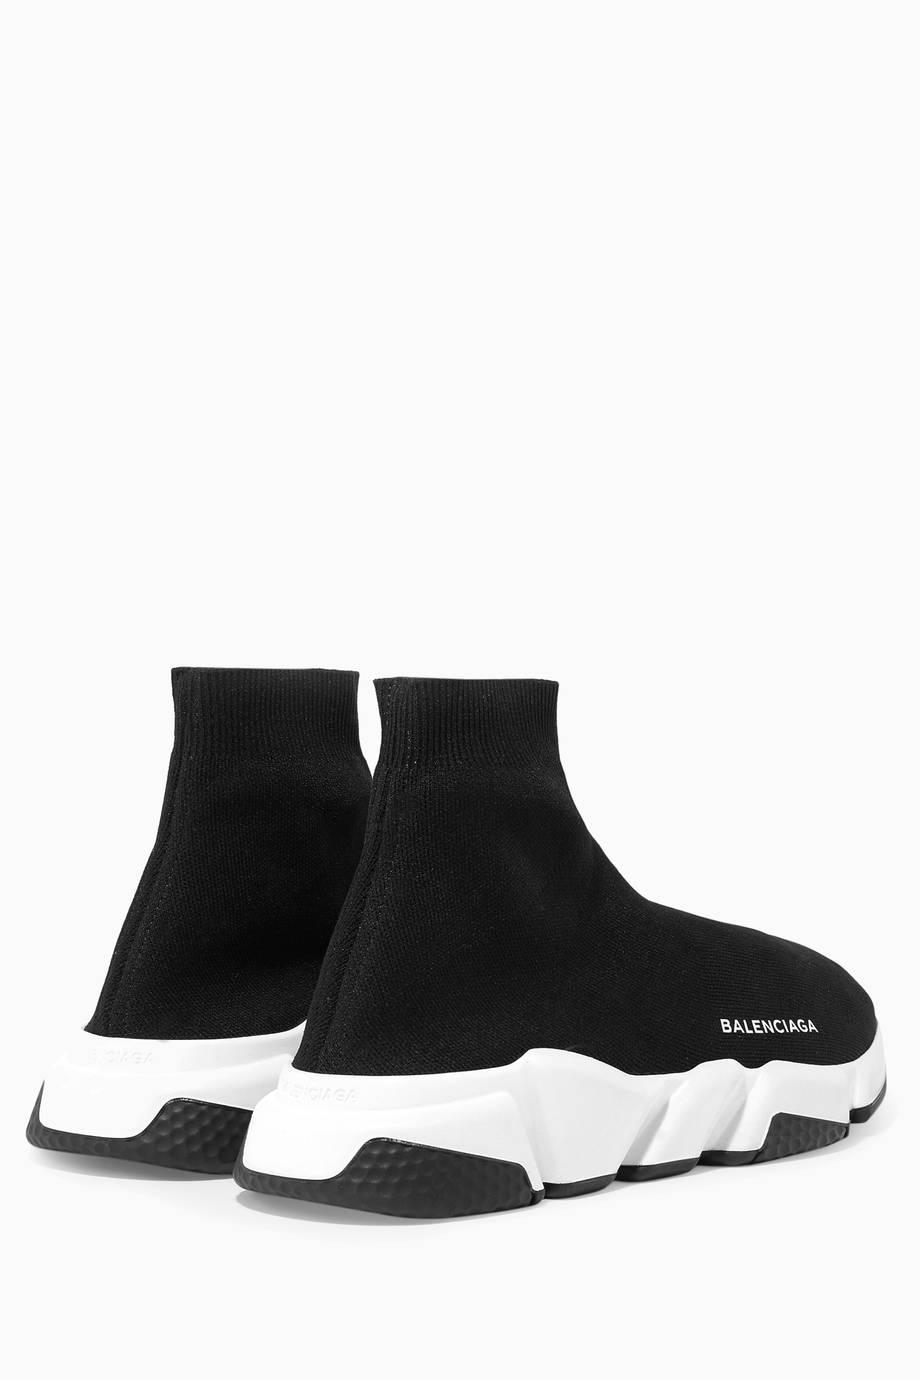 Shop Luxury Balenciaga Black Speed Sneakers Ounass Uae